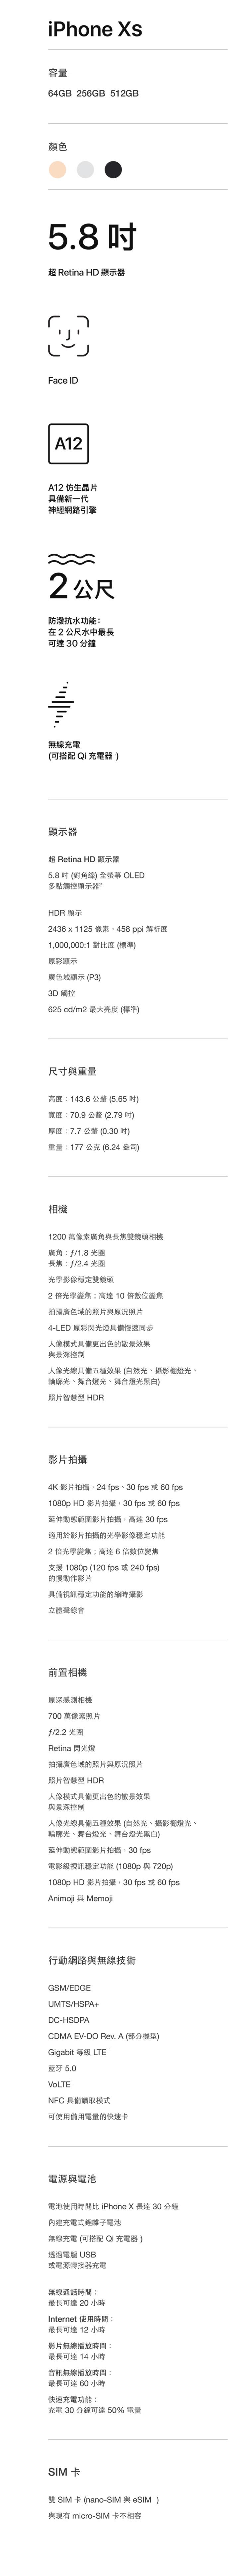 Apple iPhone XS 64G (空機) 全新福利機 各色限量清倉特價中XR X MAX i8+ i7+